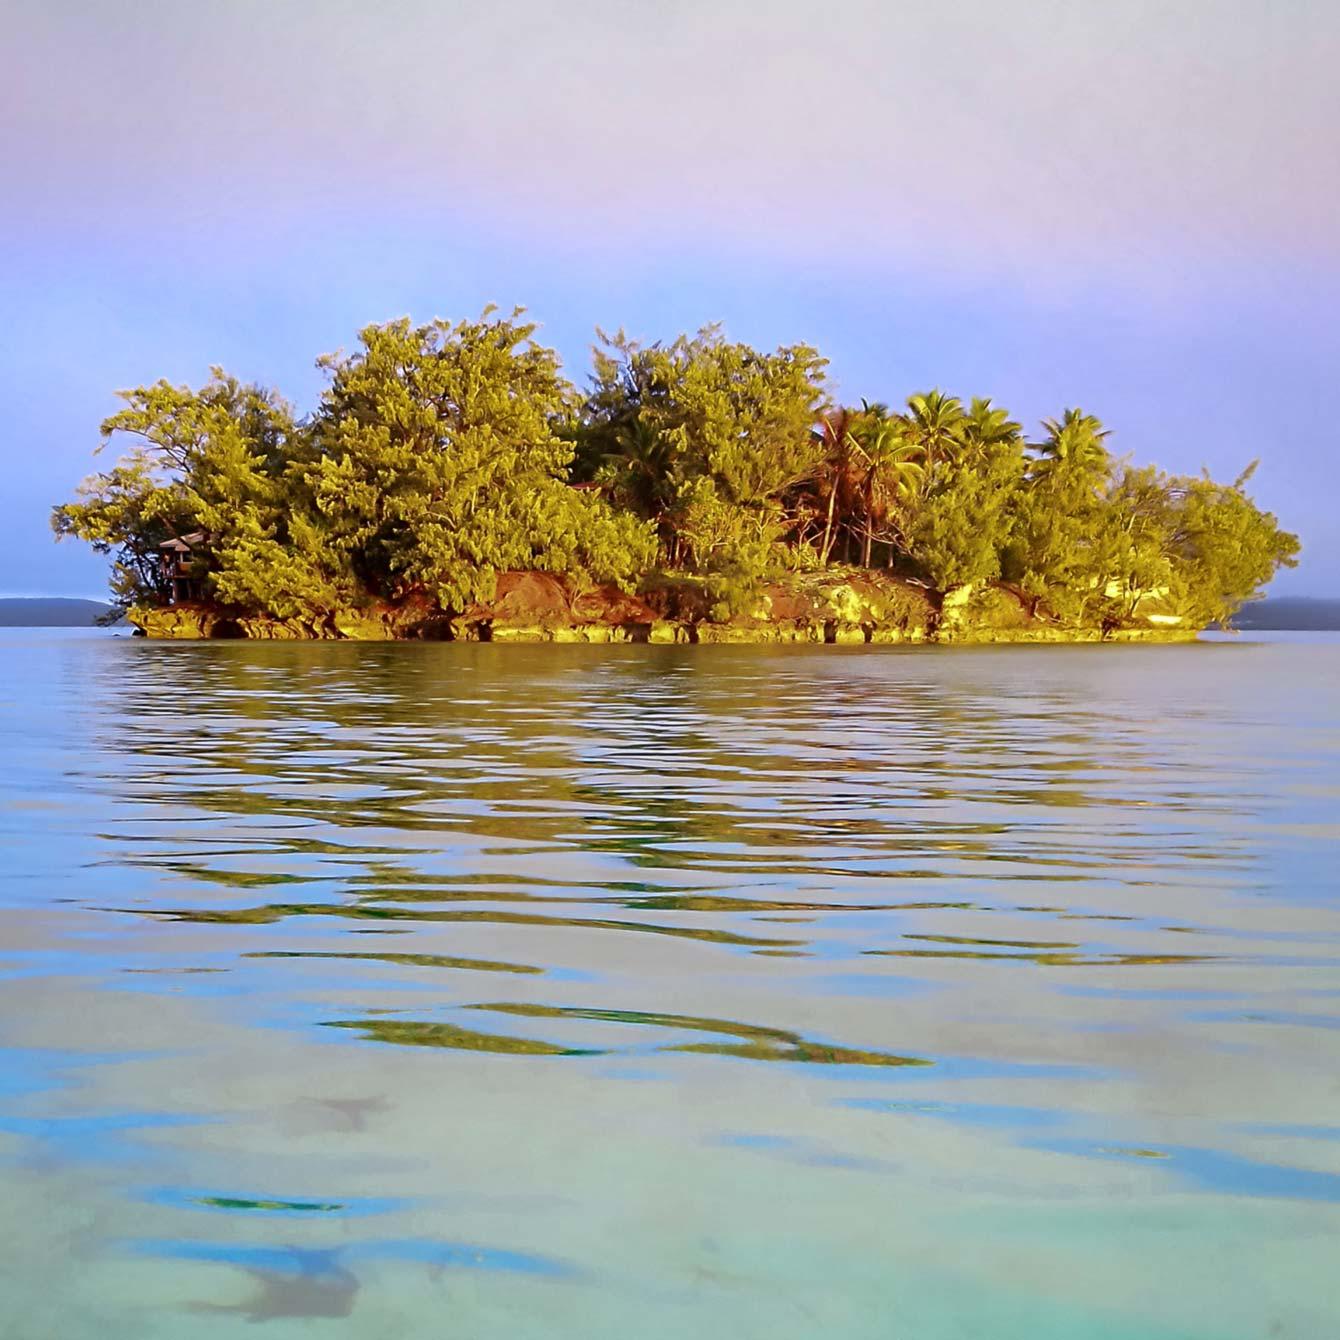 Tonga, Vava'u Group Vacation